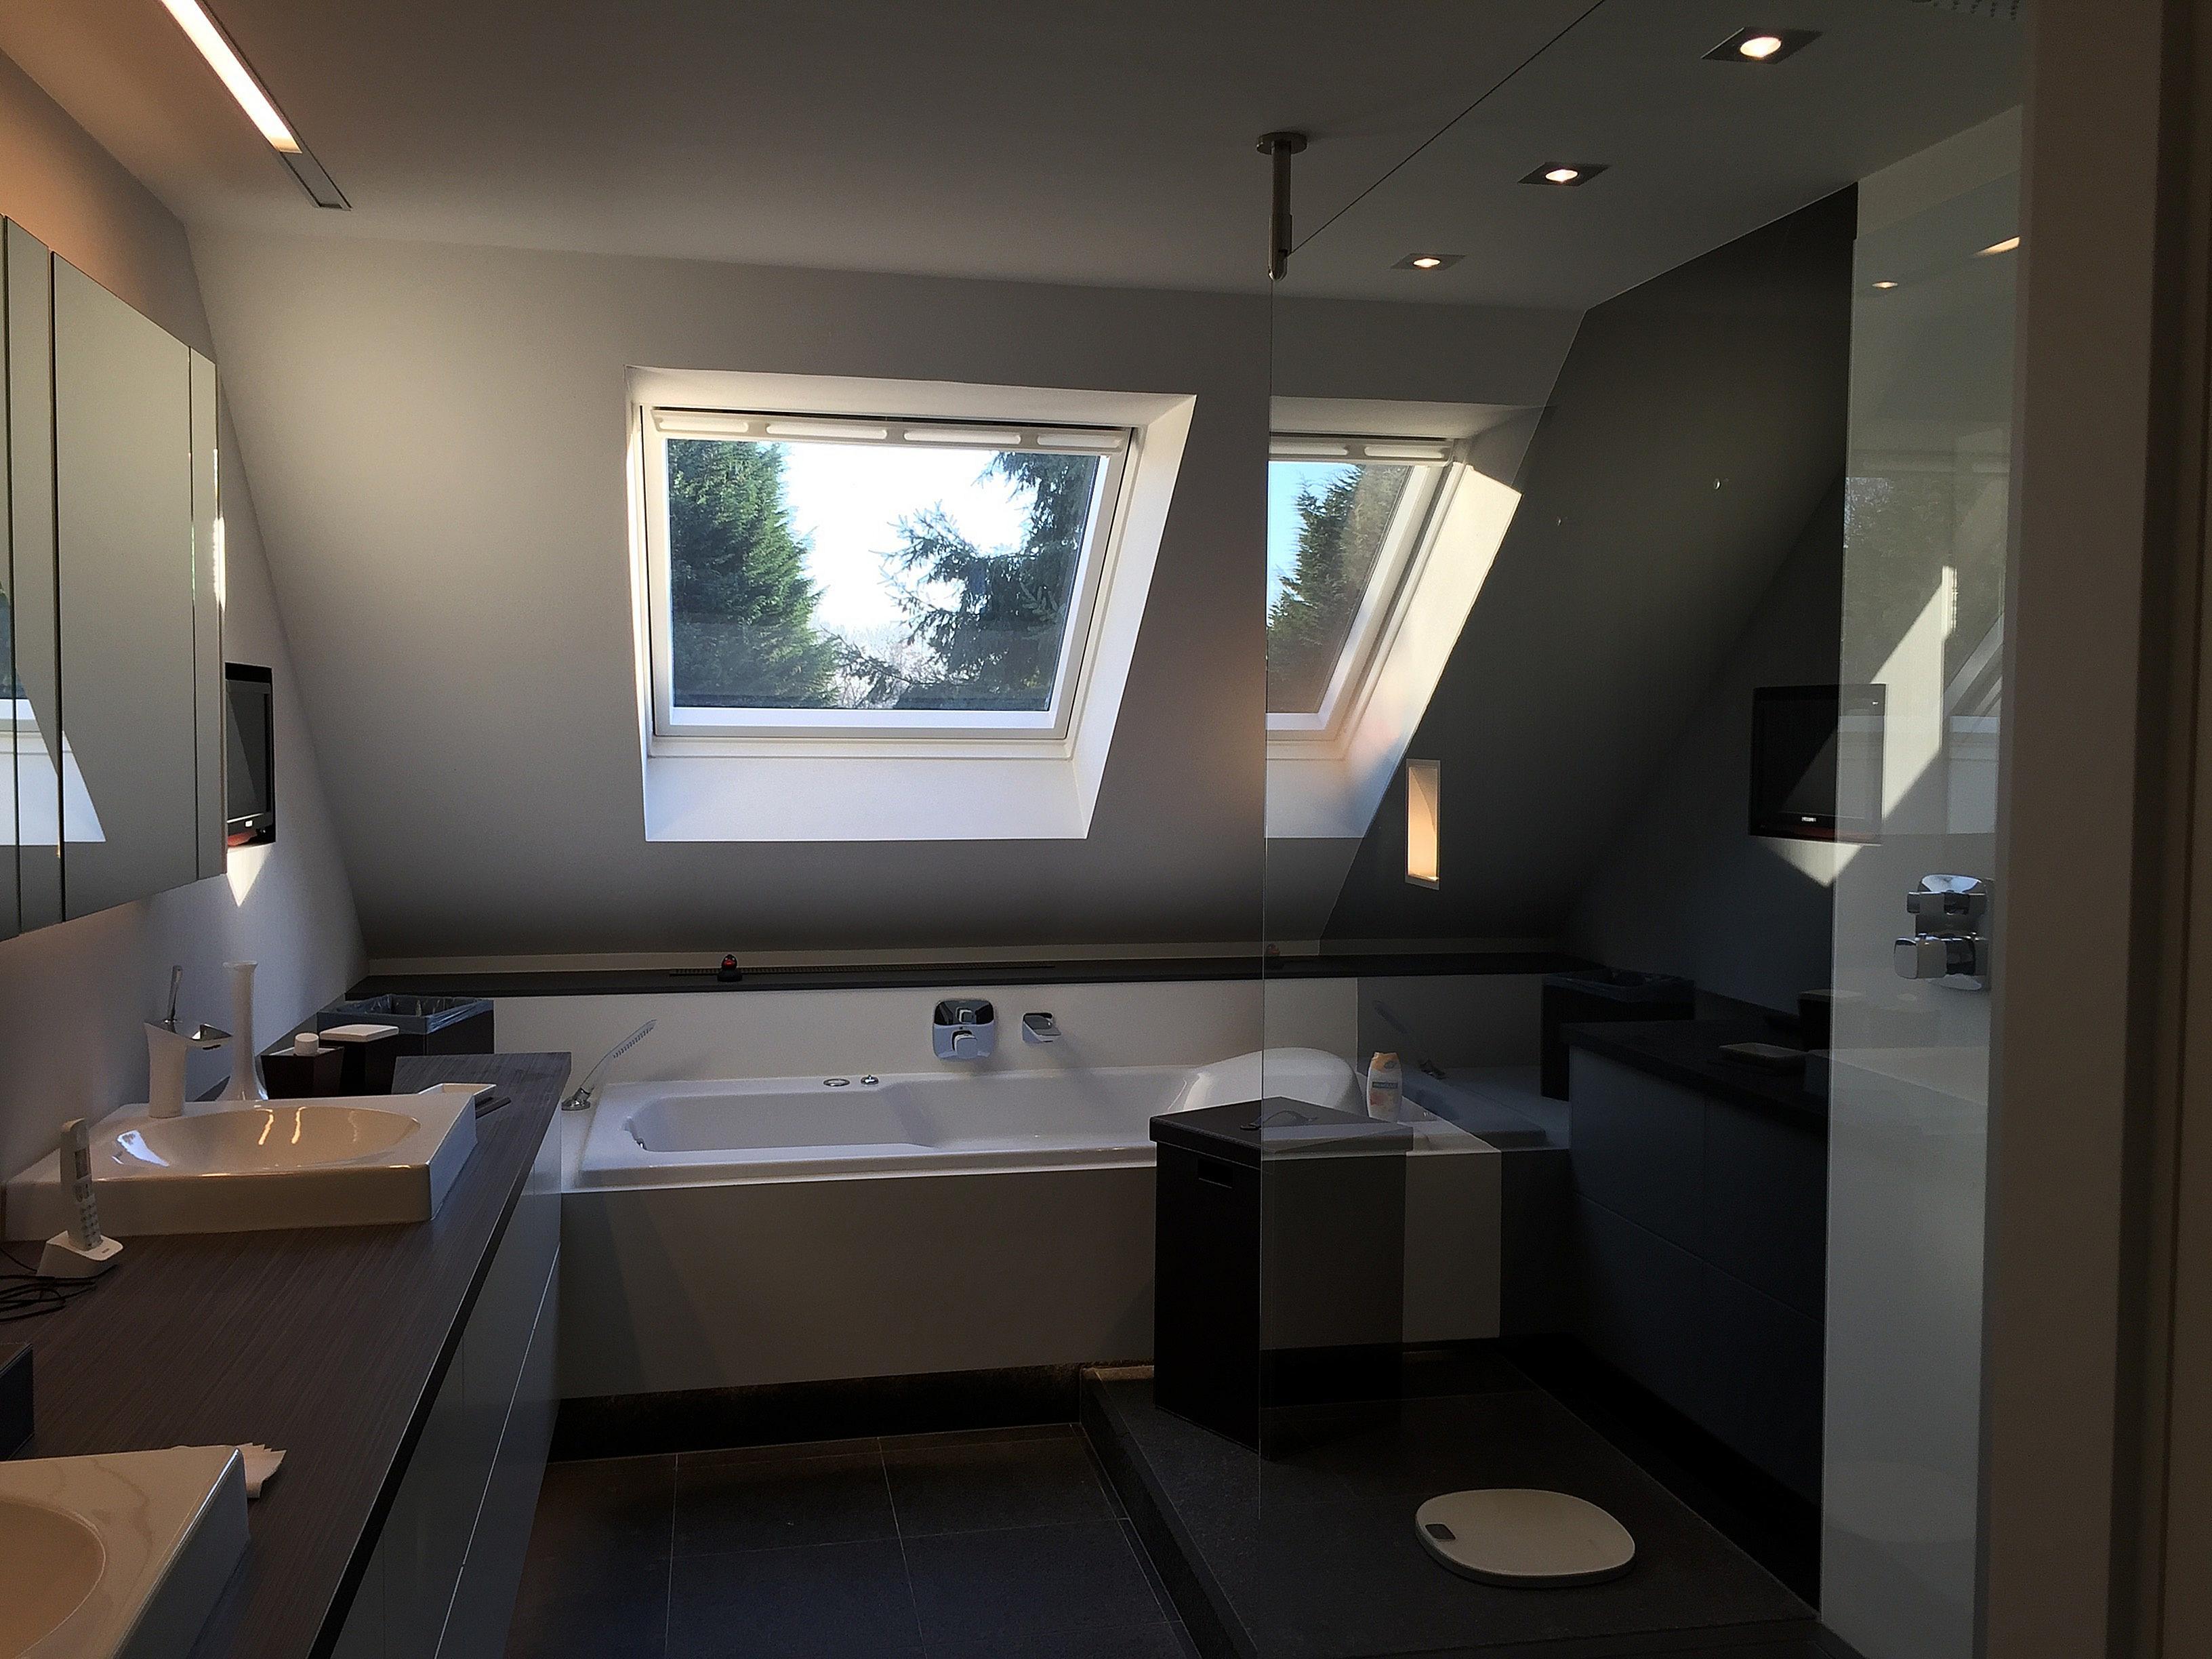 Badkamers - Ramaekers Interieur